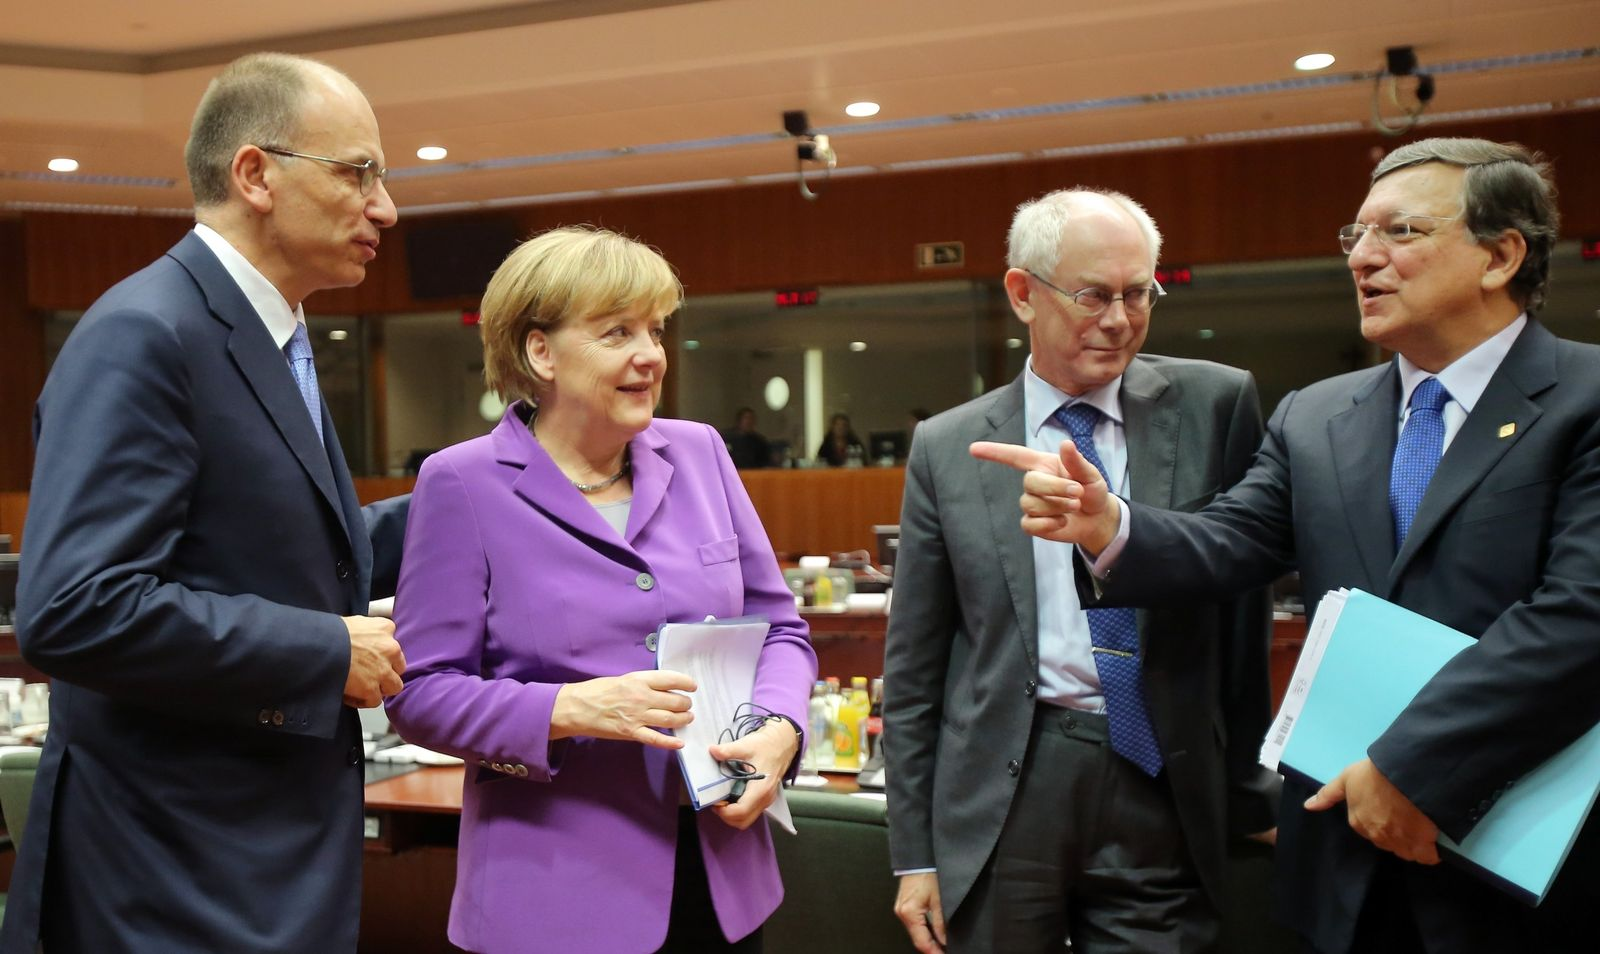 Enrico Letta, Angela Merkel, Jose Manuel Barroso, Herman Van Rompuy